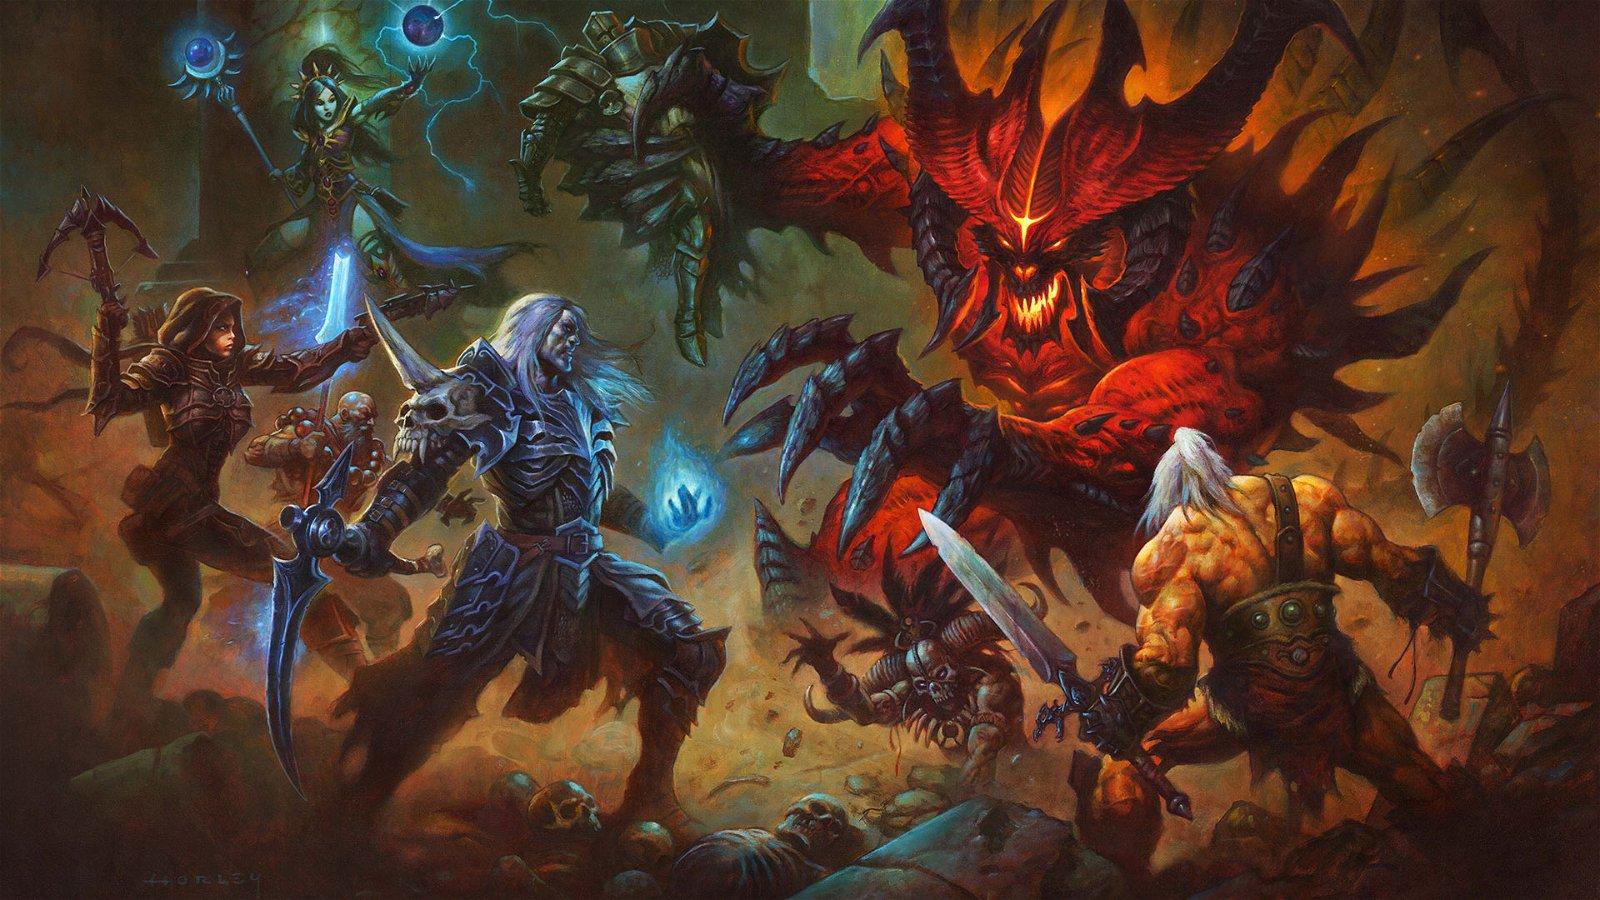 Diablo III: Rise of the Necromancer Review - Nostalgia Done Right 7